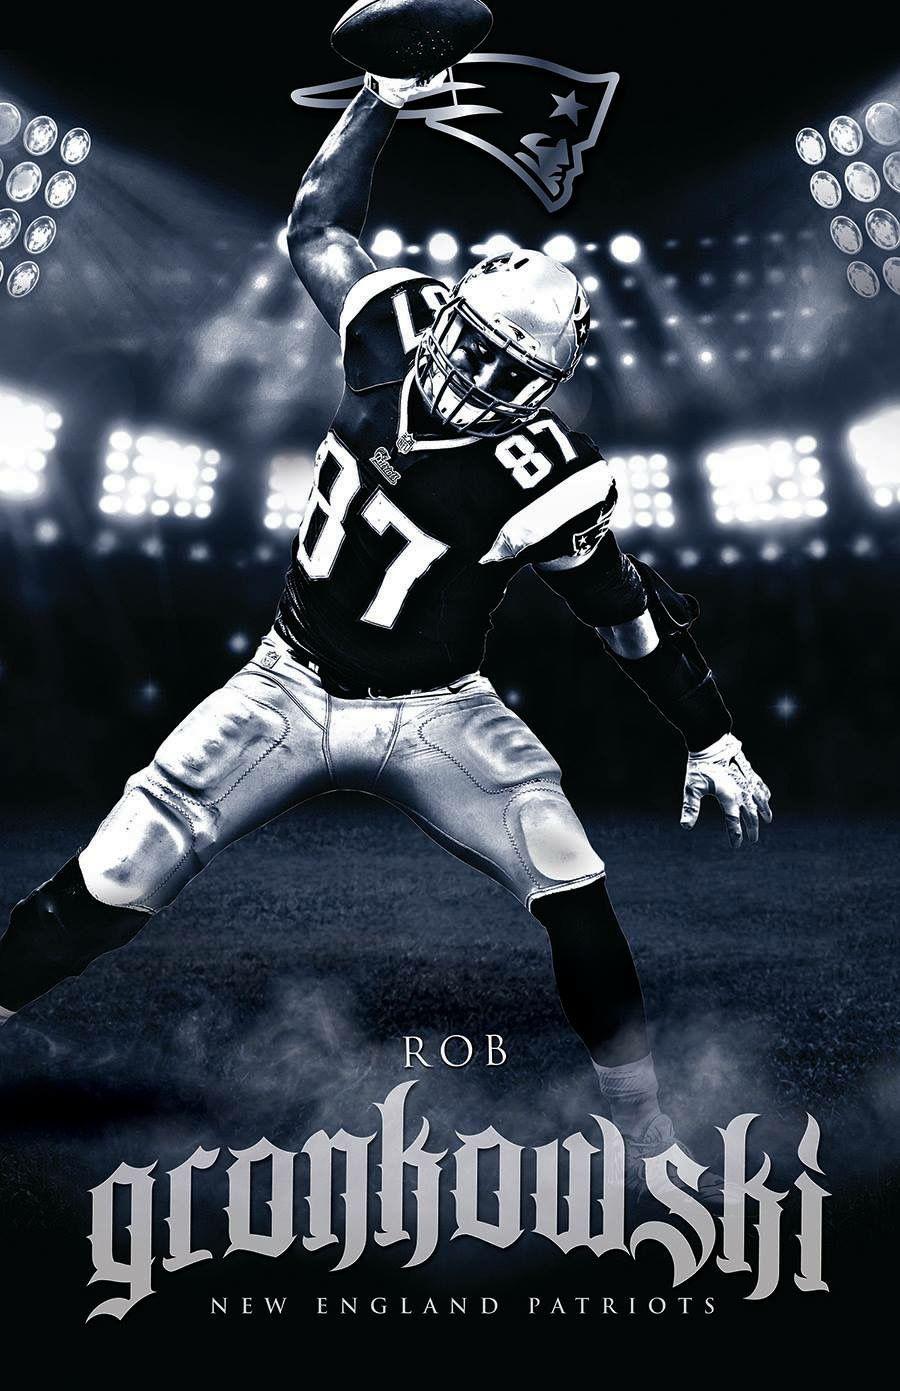 Pin By Marsha Tassey On Reag Sports New England Patriots Patriots New England Patriots Football